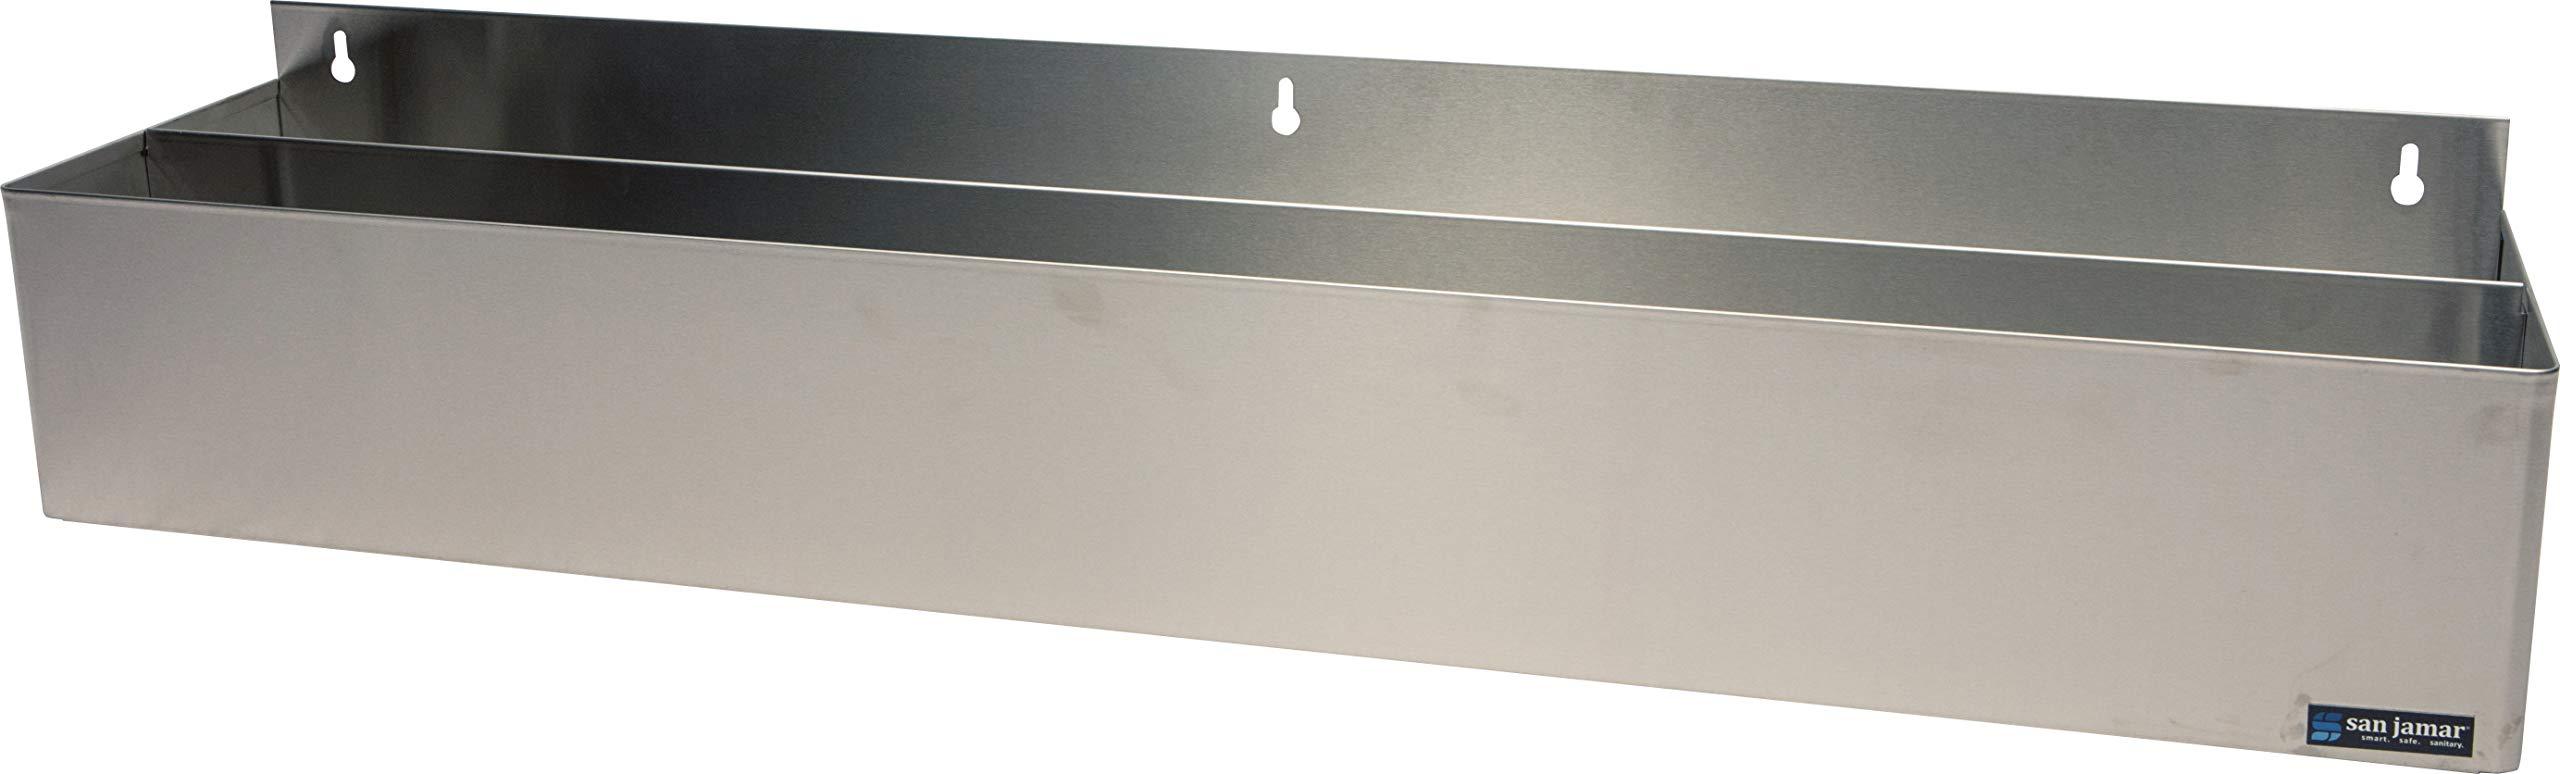 San Jamar B5542 Stainless Steel Single Rail Speed Rack Bottle Holder, 41-1/4'' Width x 6'' Height x 4-1/8'' Depth